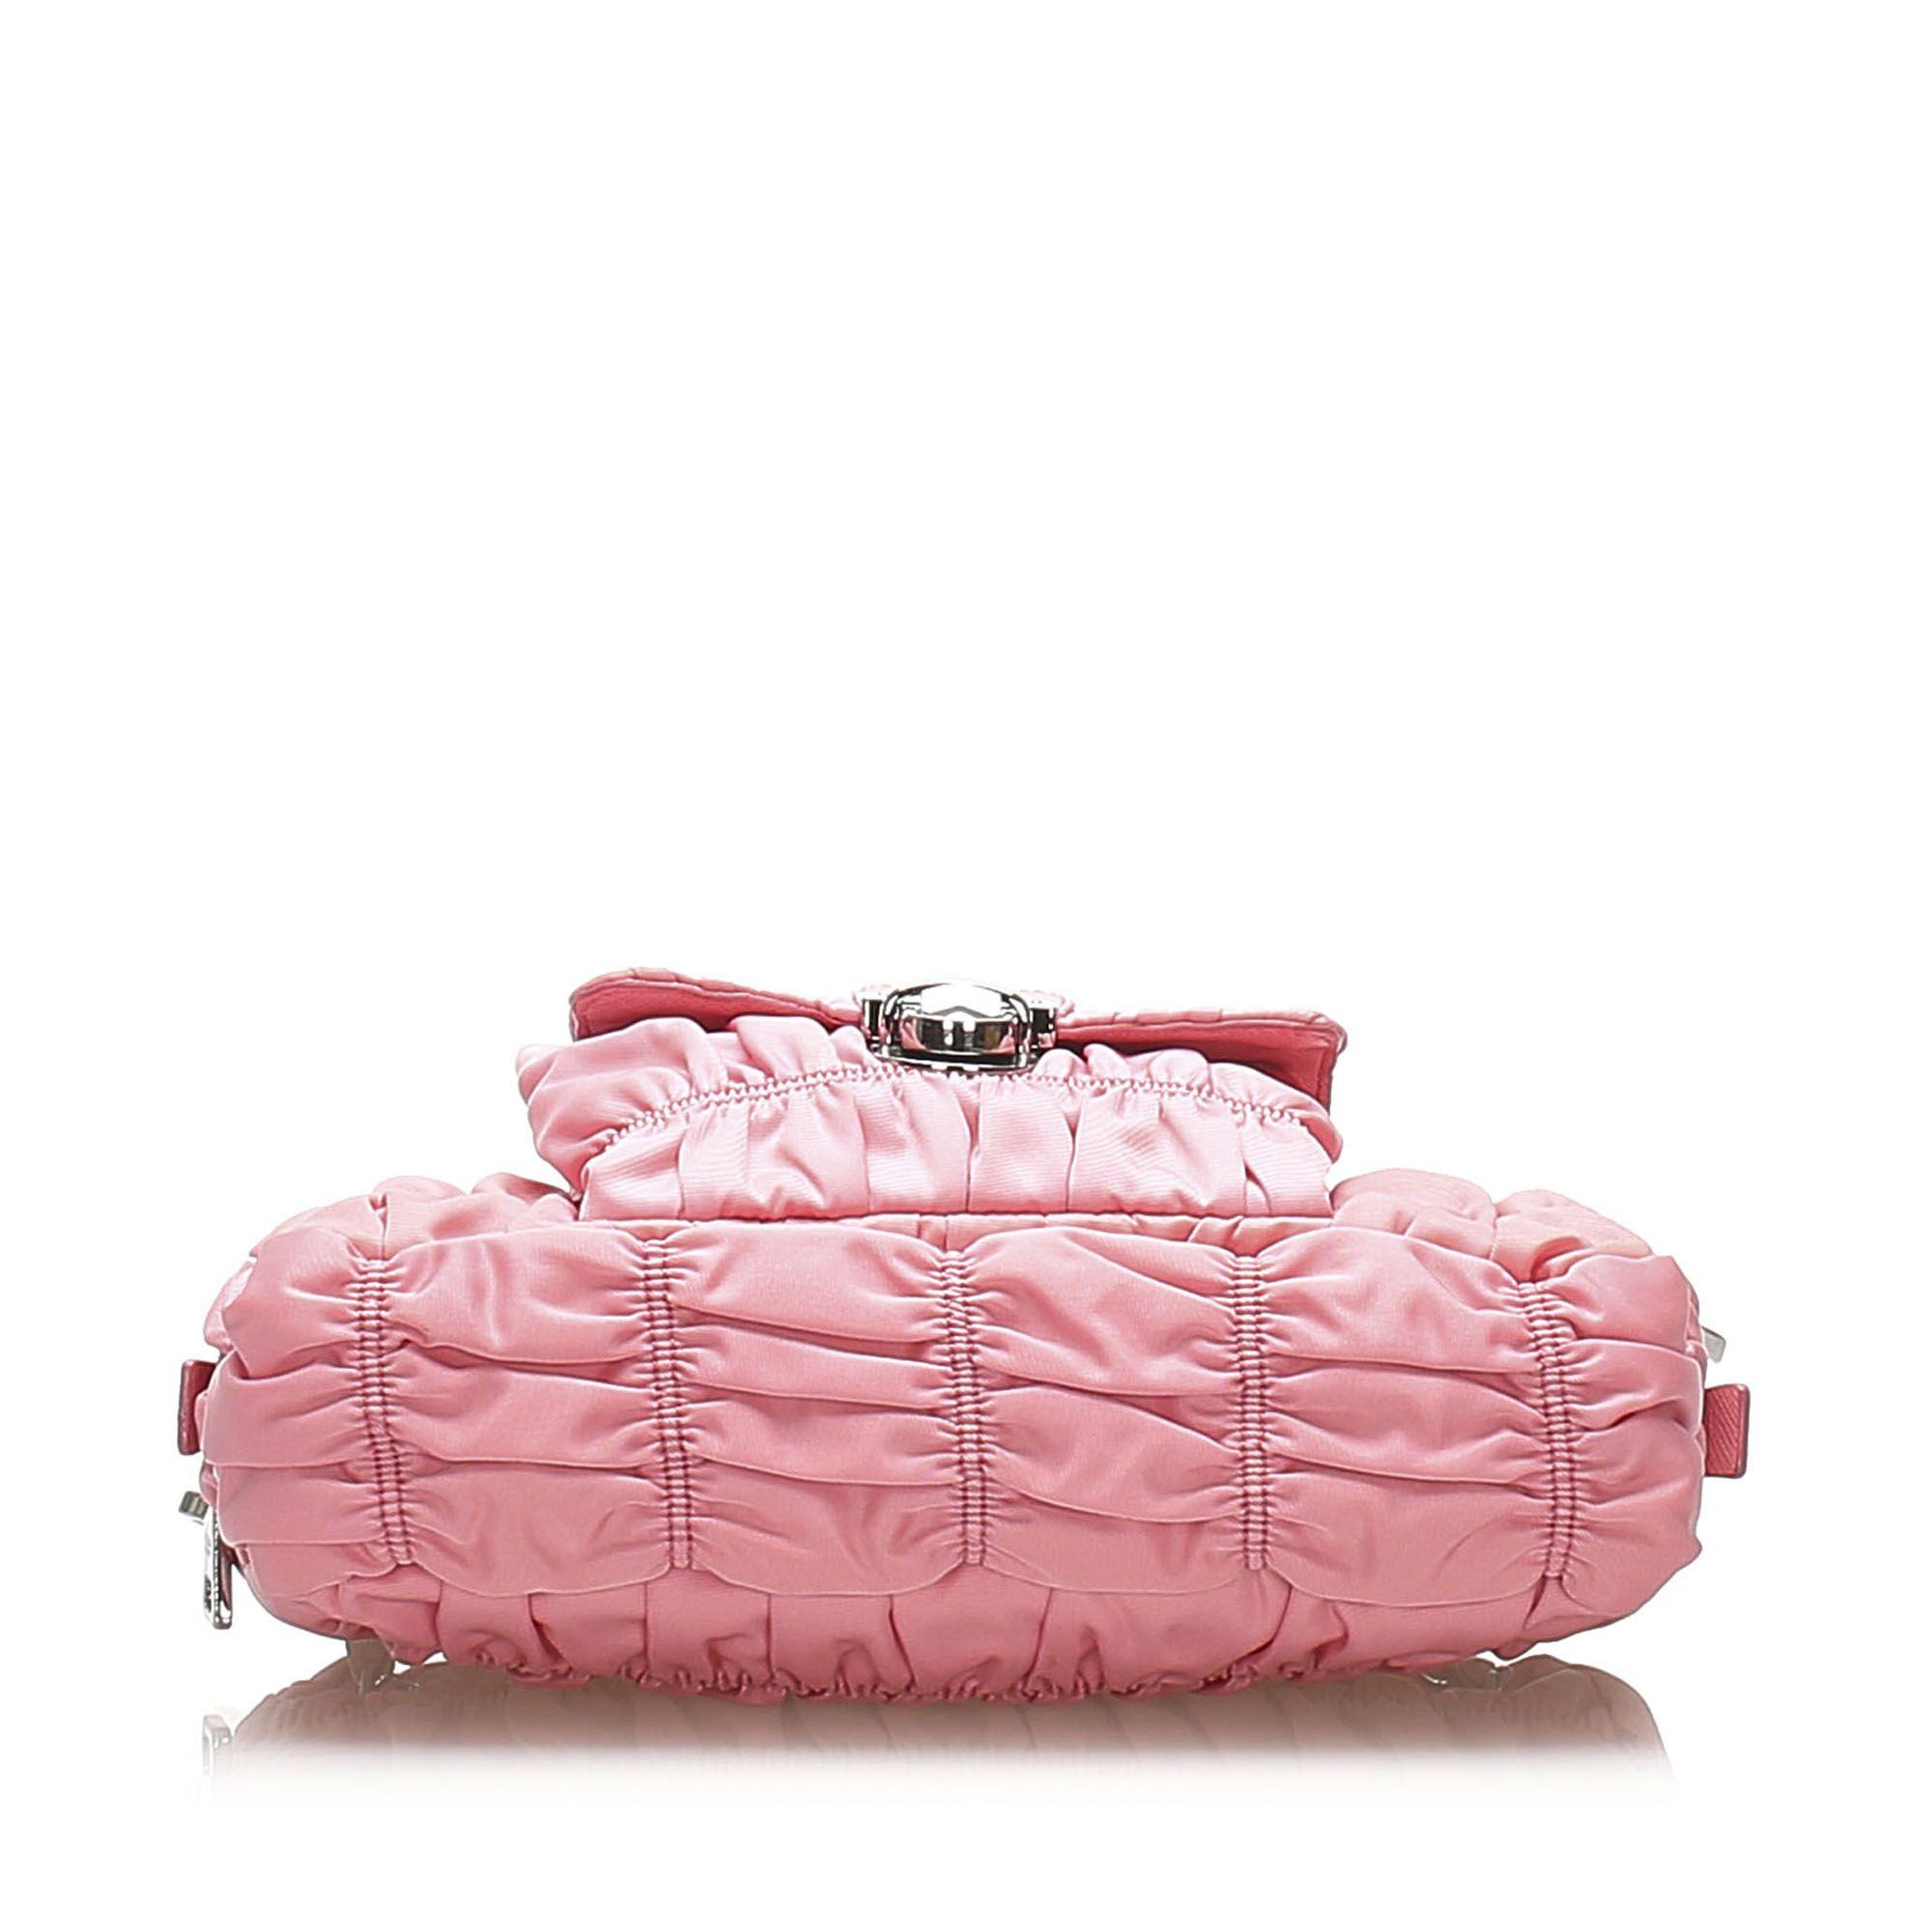 Vintage Prada Tessuto Gaufre Shoulder Bag Pink